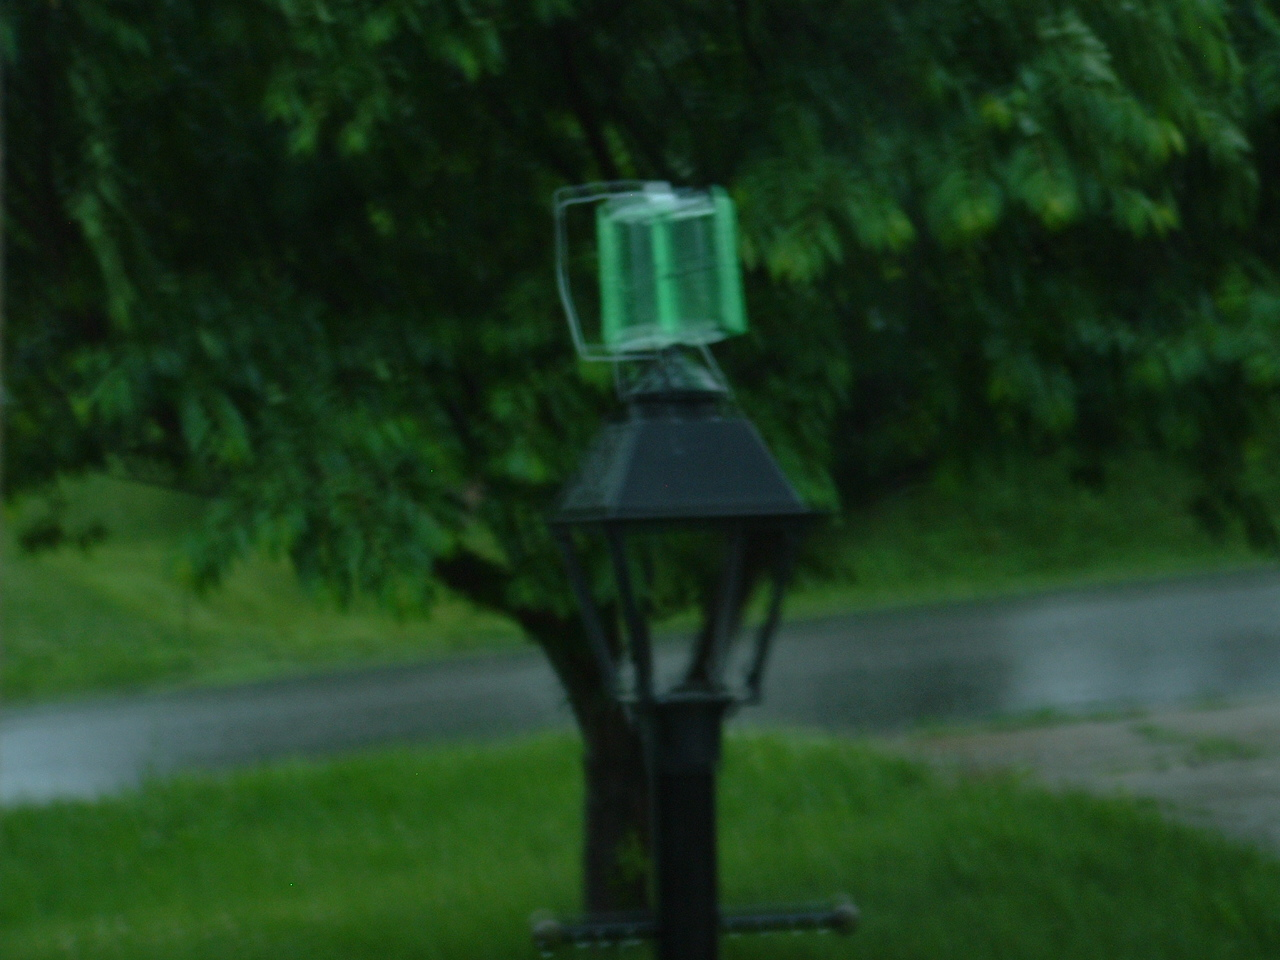 Wind Powered Yard Light